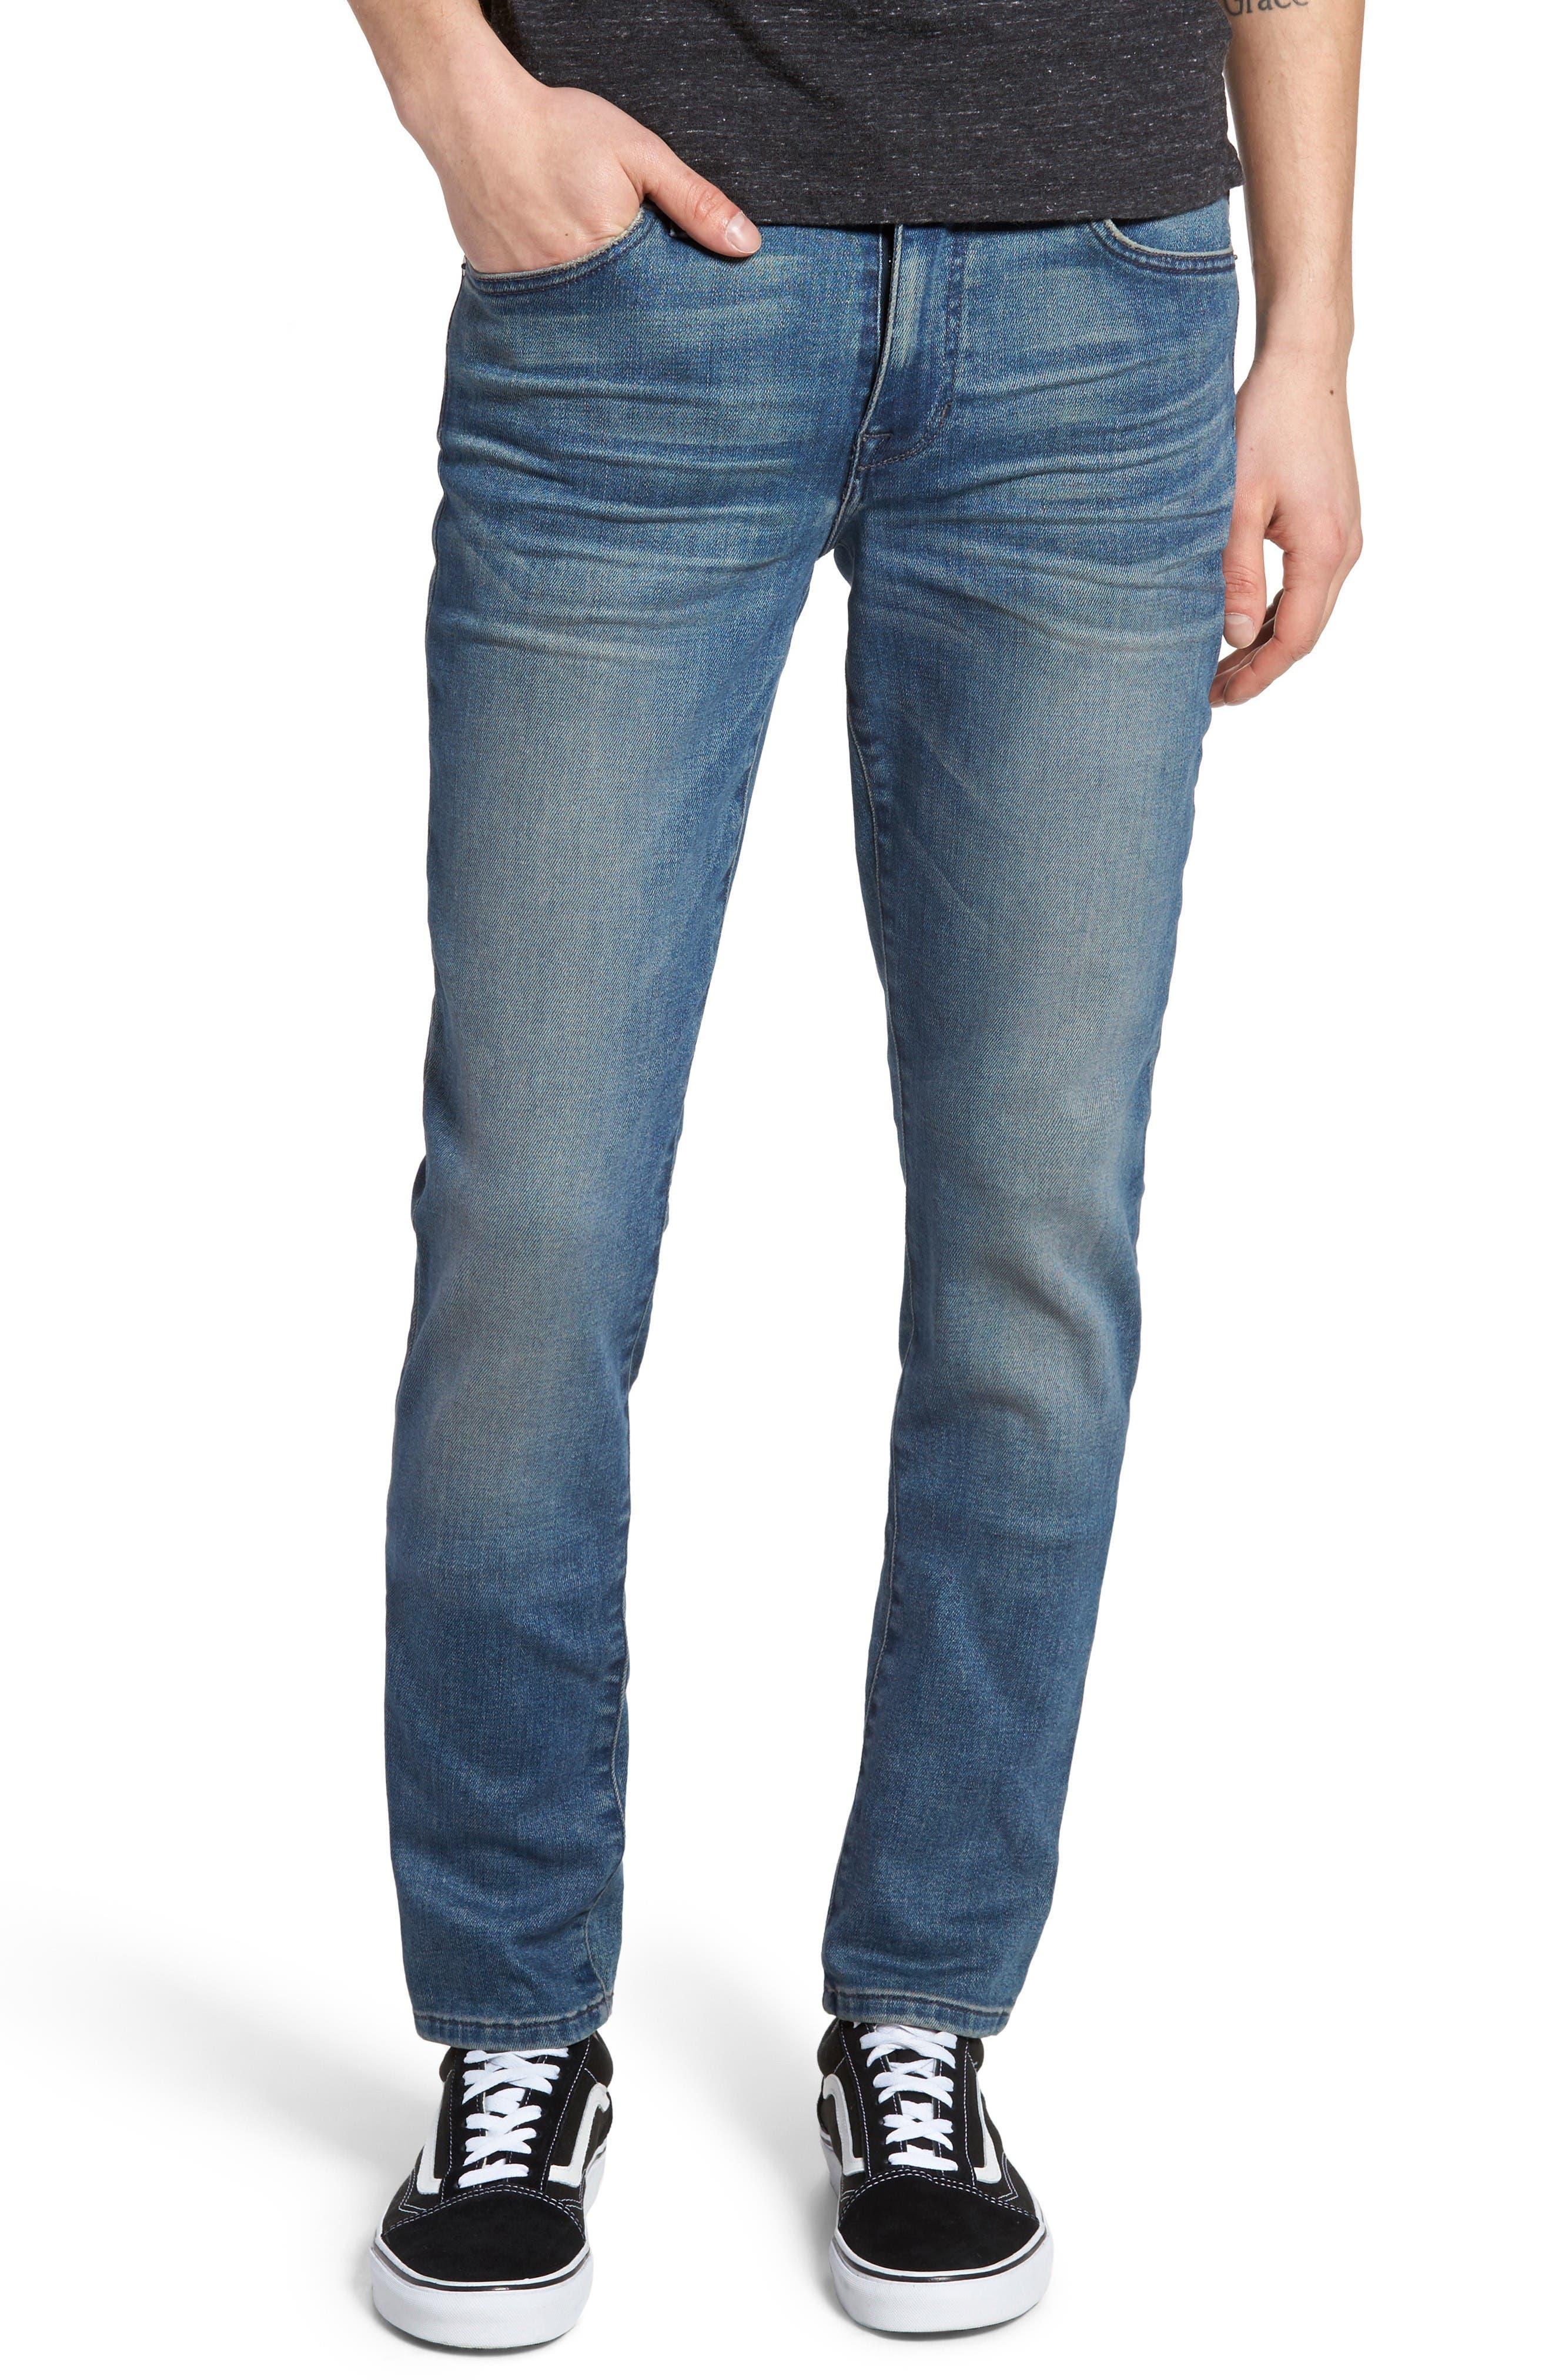 Joe's Legend Skinny Fit Jeans (Micah)